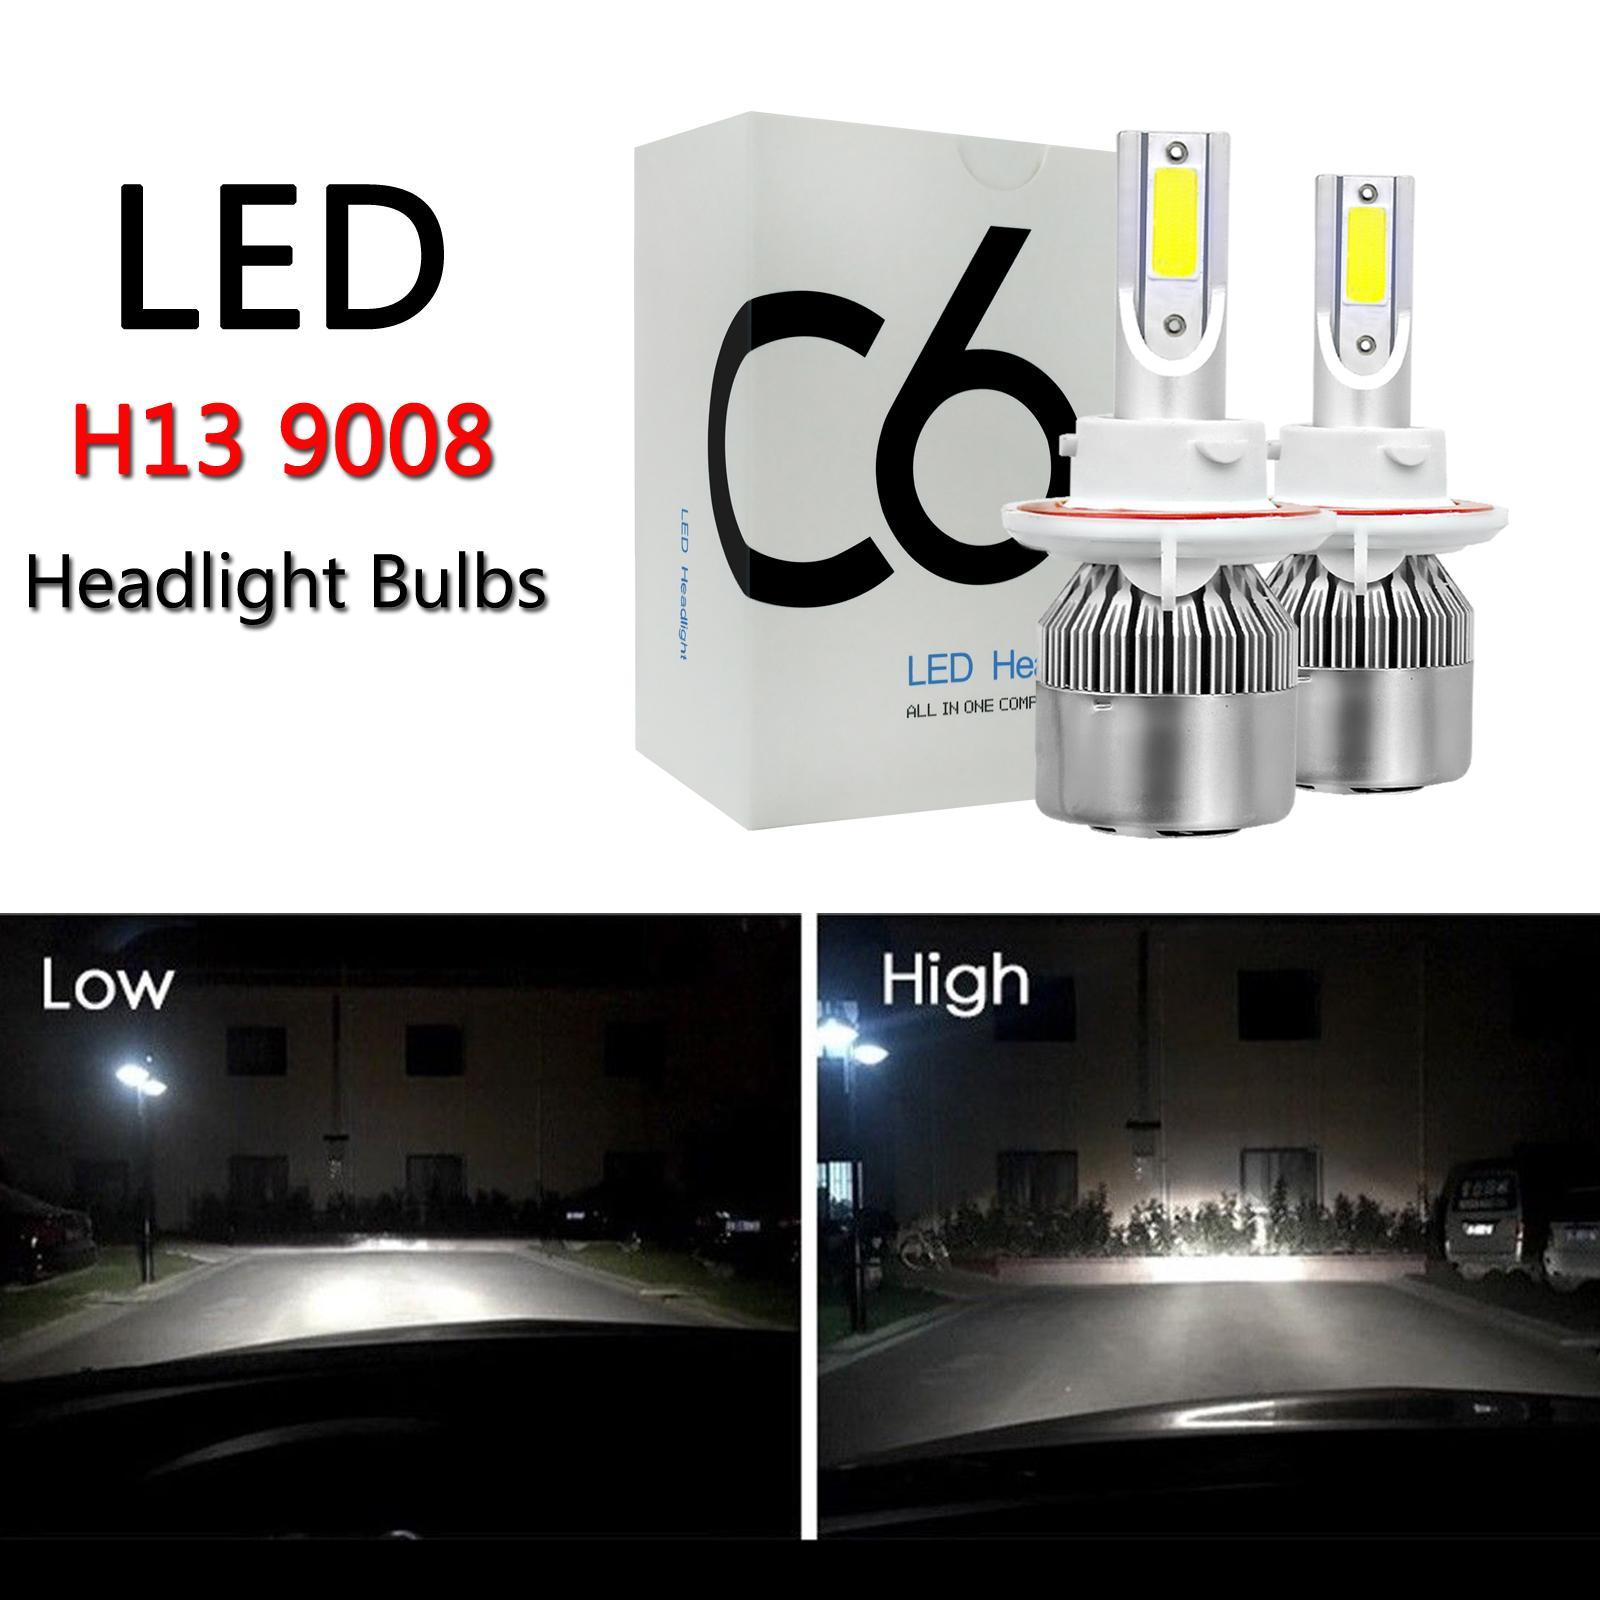 areourshop h13 9008 c6 led مصباح التصوير أطقم المصابيح مرحبا / منخفض شعاع عالية الطاقة 6000 كيلو سيارة اكسسوارات السيارات أجزاء